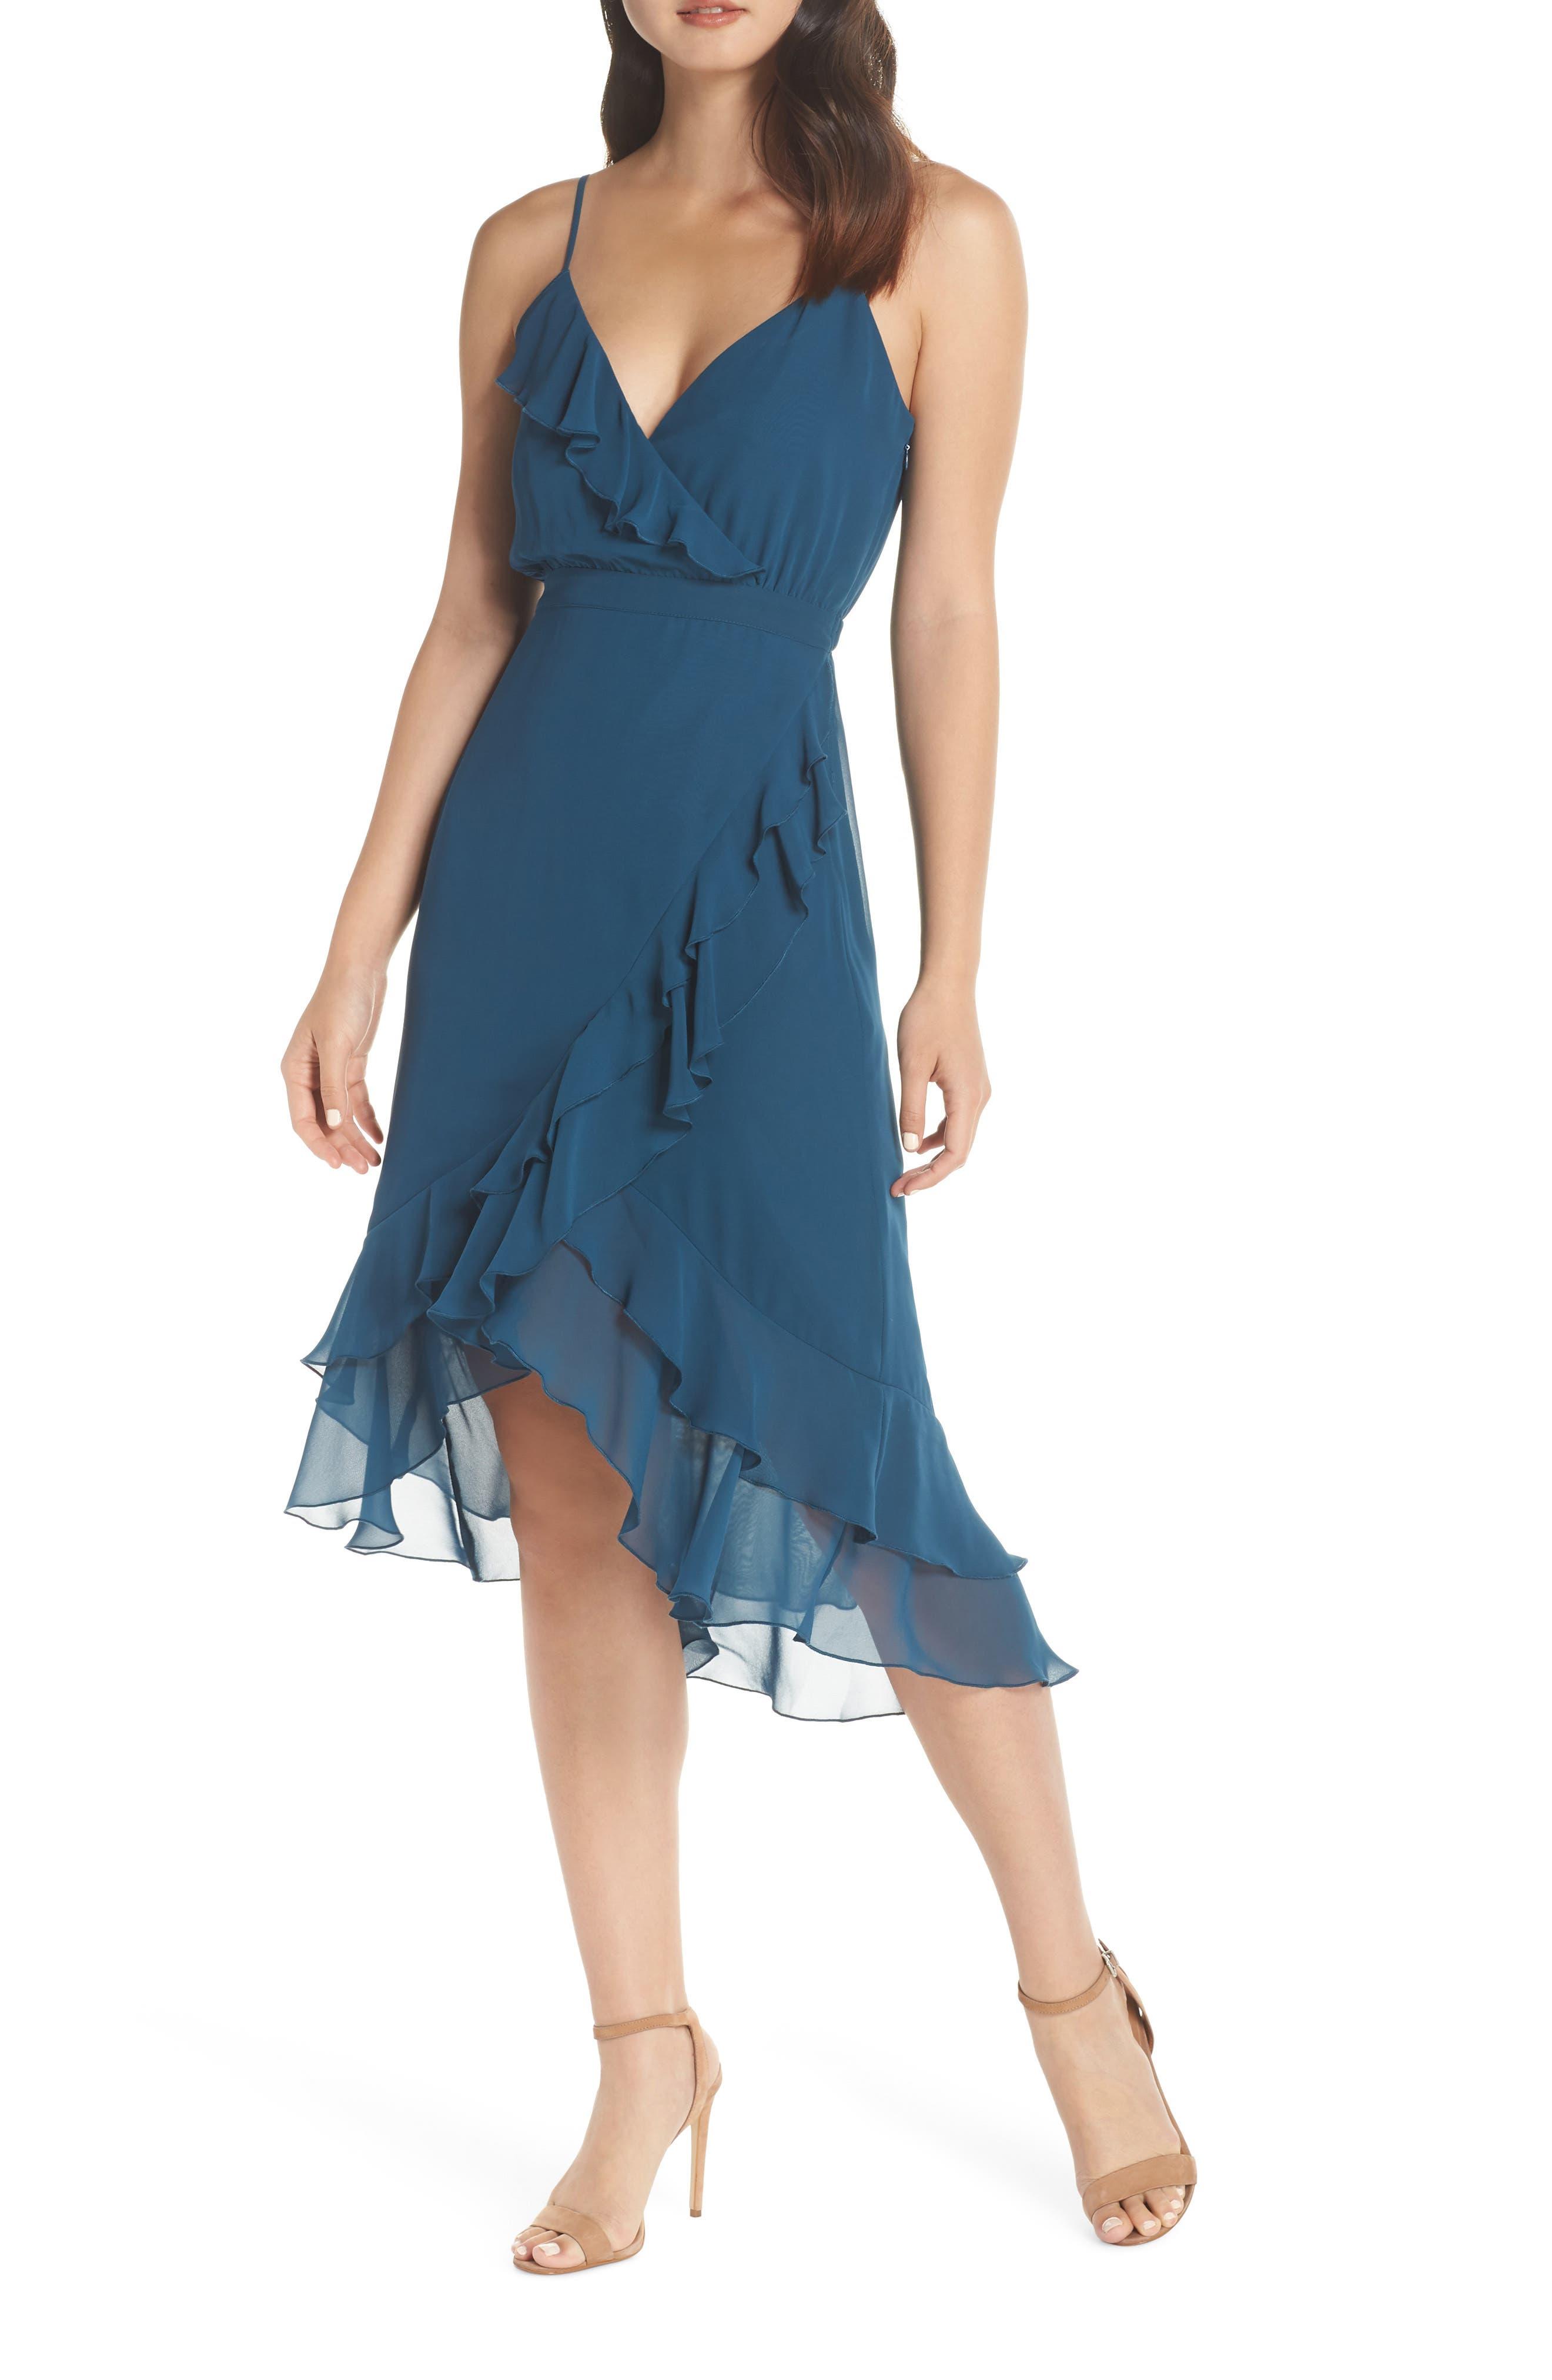 Ali & Jay Pretty Lady High/low Dress, Blue